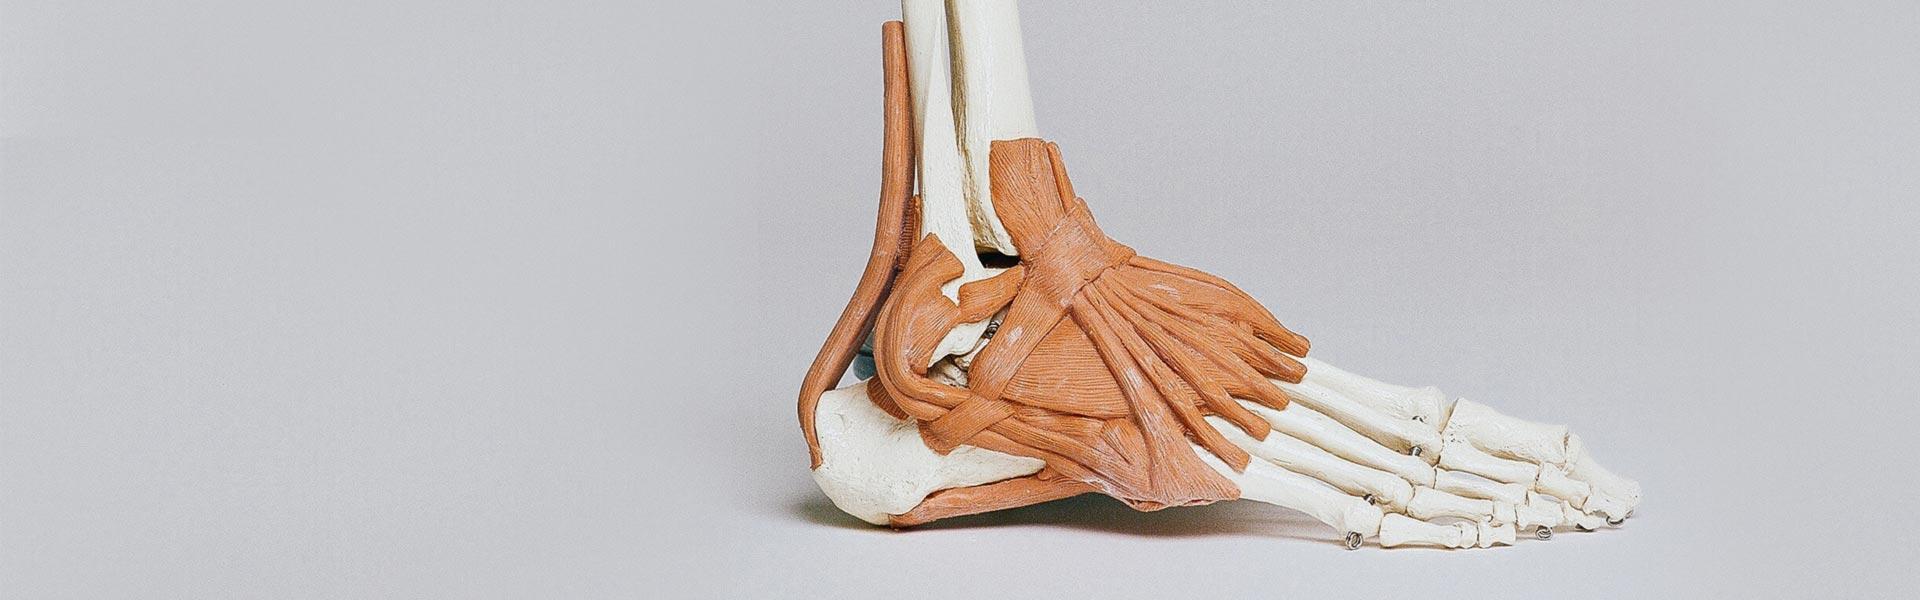 Szkielet stopy